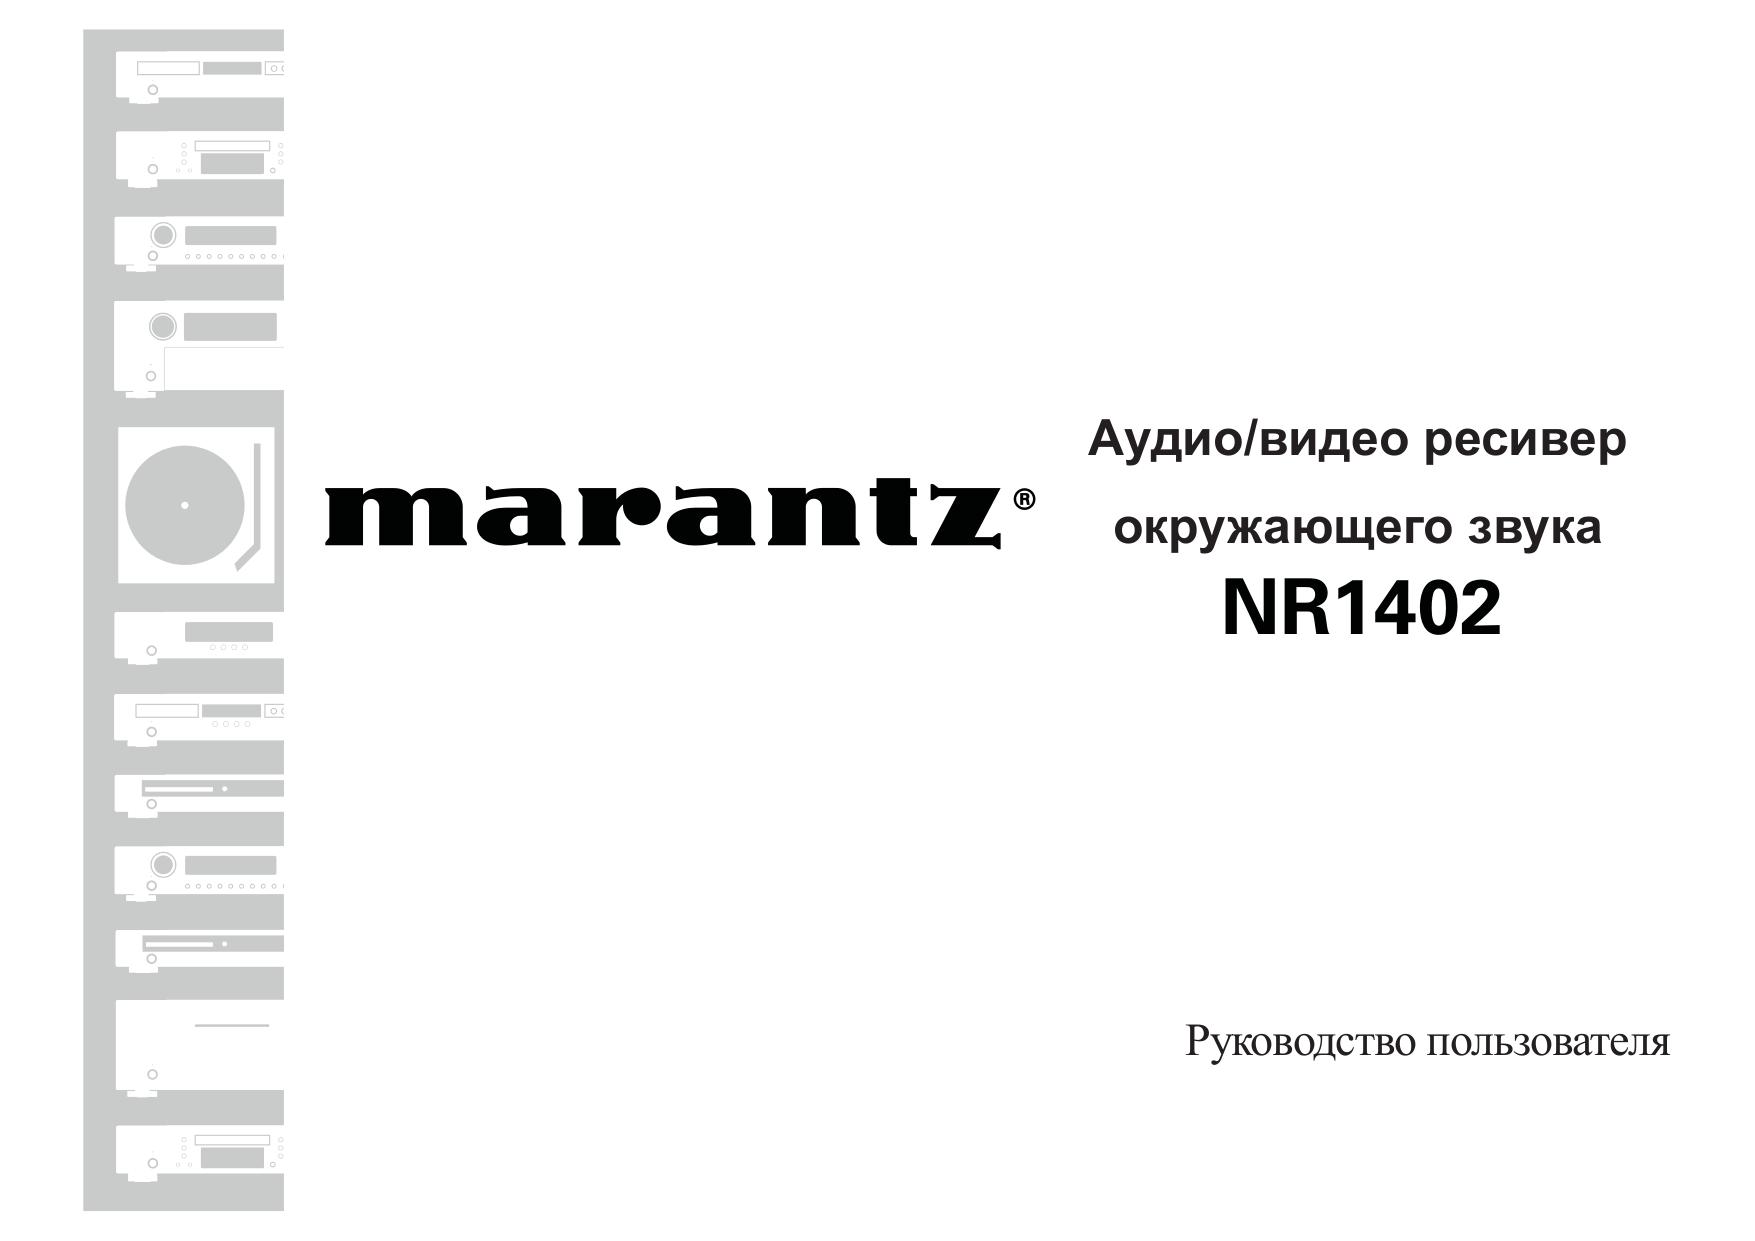 Marantz nr1402 owners manual array download free pdf for marantz nr1402 receiver manual rh umlib com fandeluxe Image collections